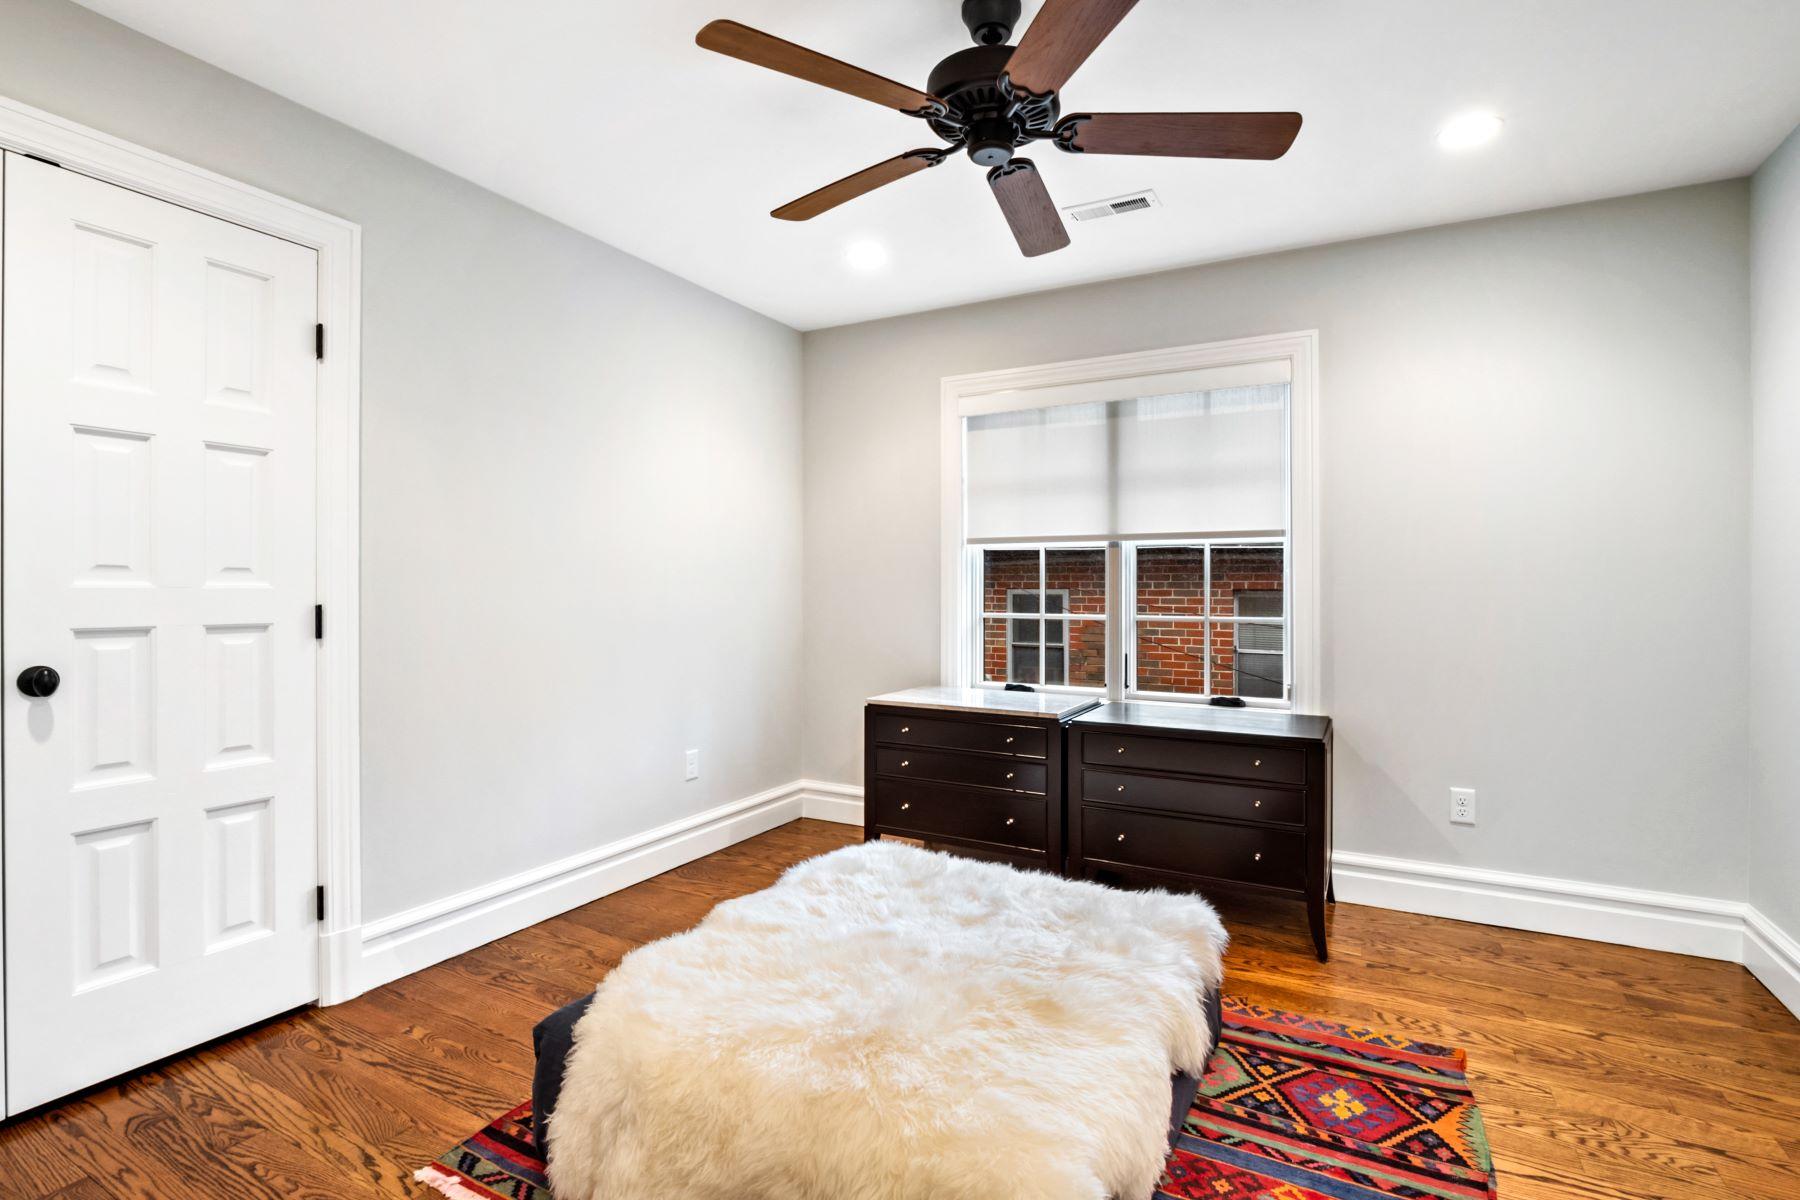 Additional photo for property listing at 7430 Delmar Blvd 7430 Delmar Boulevard University City, Missouri 63130 United States